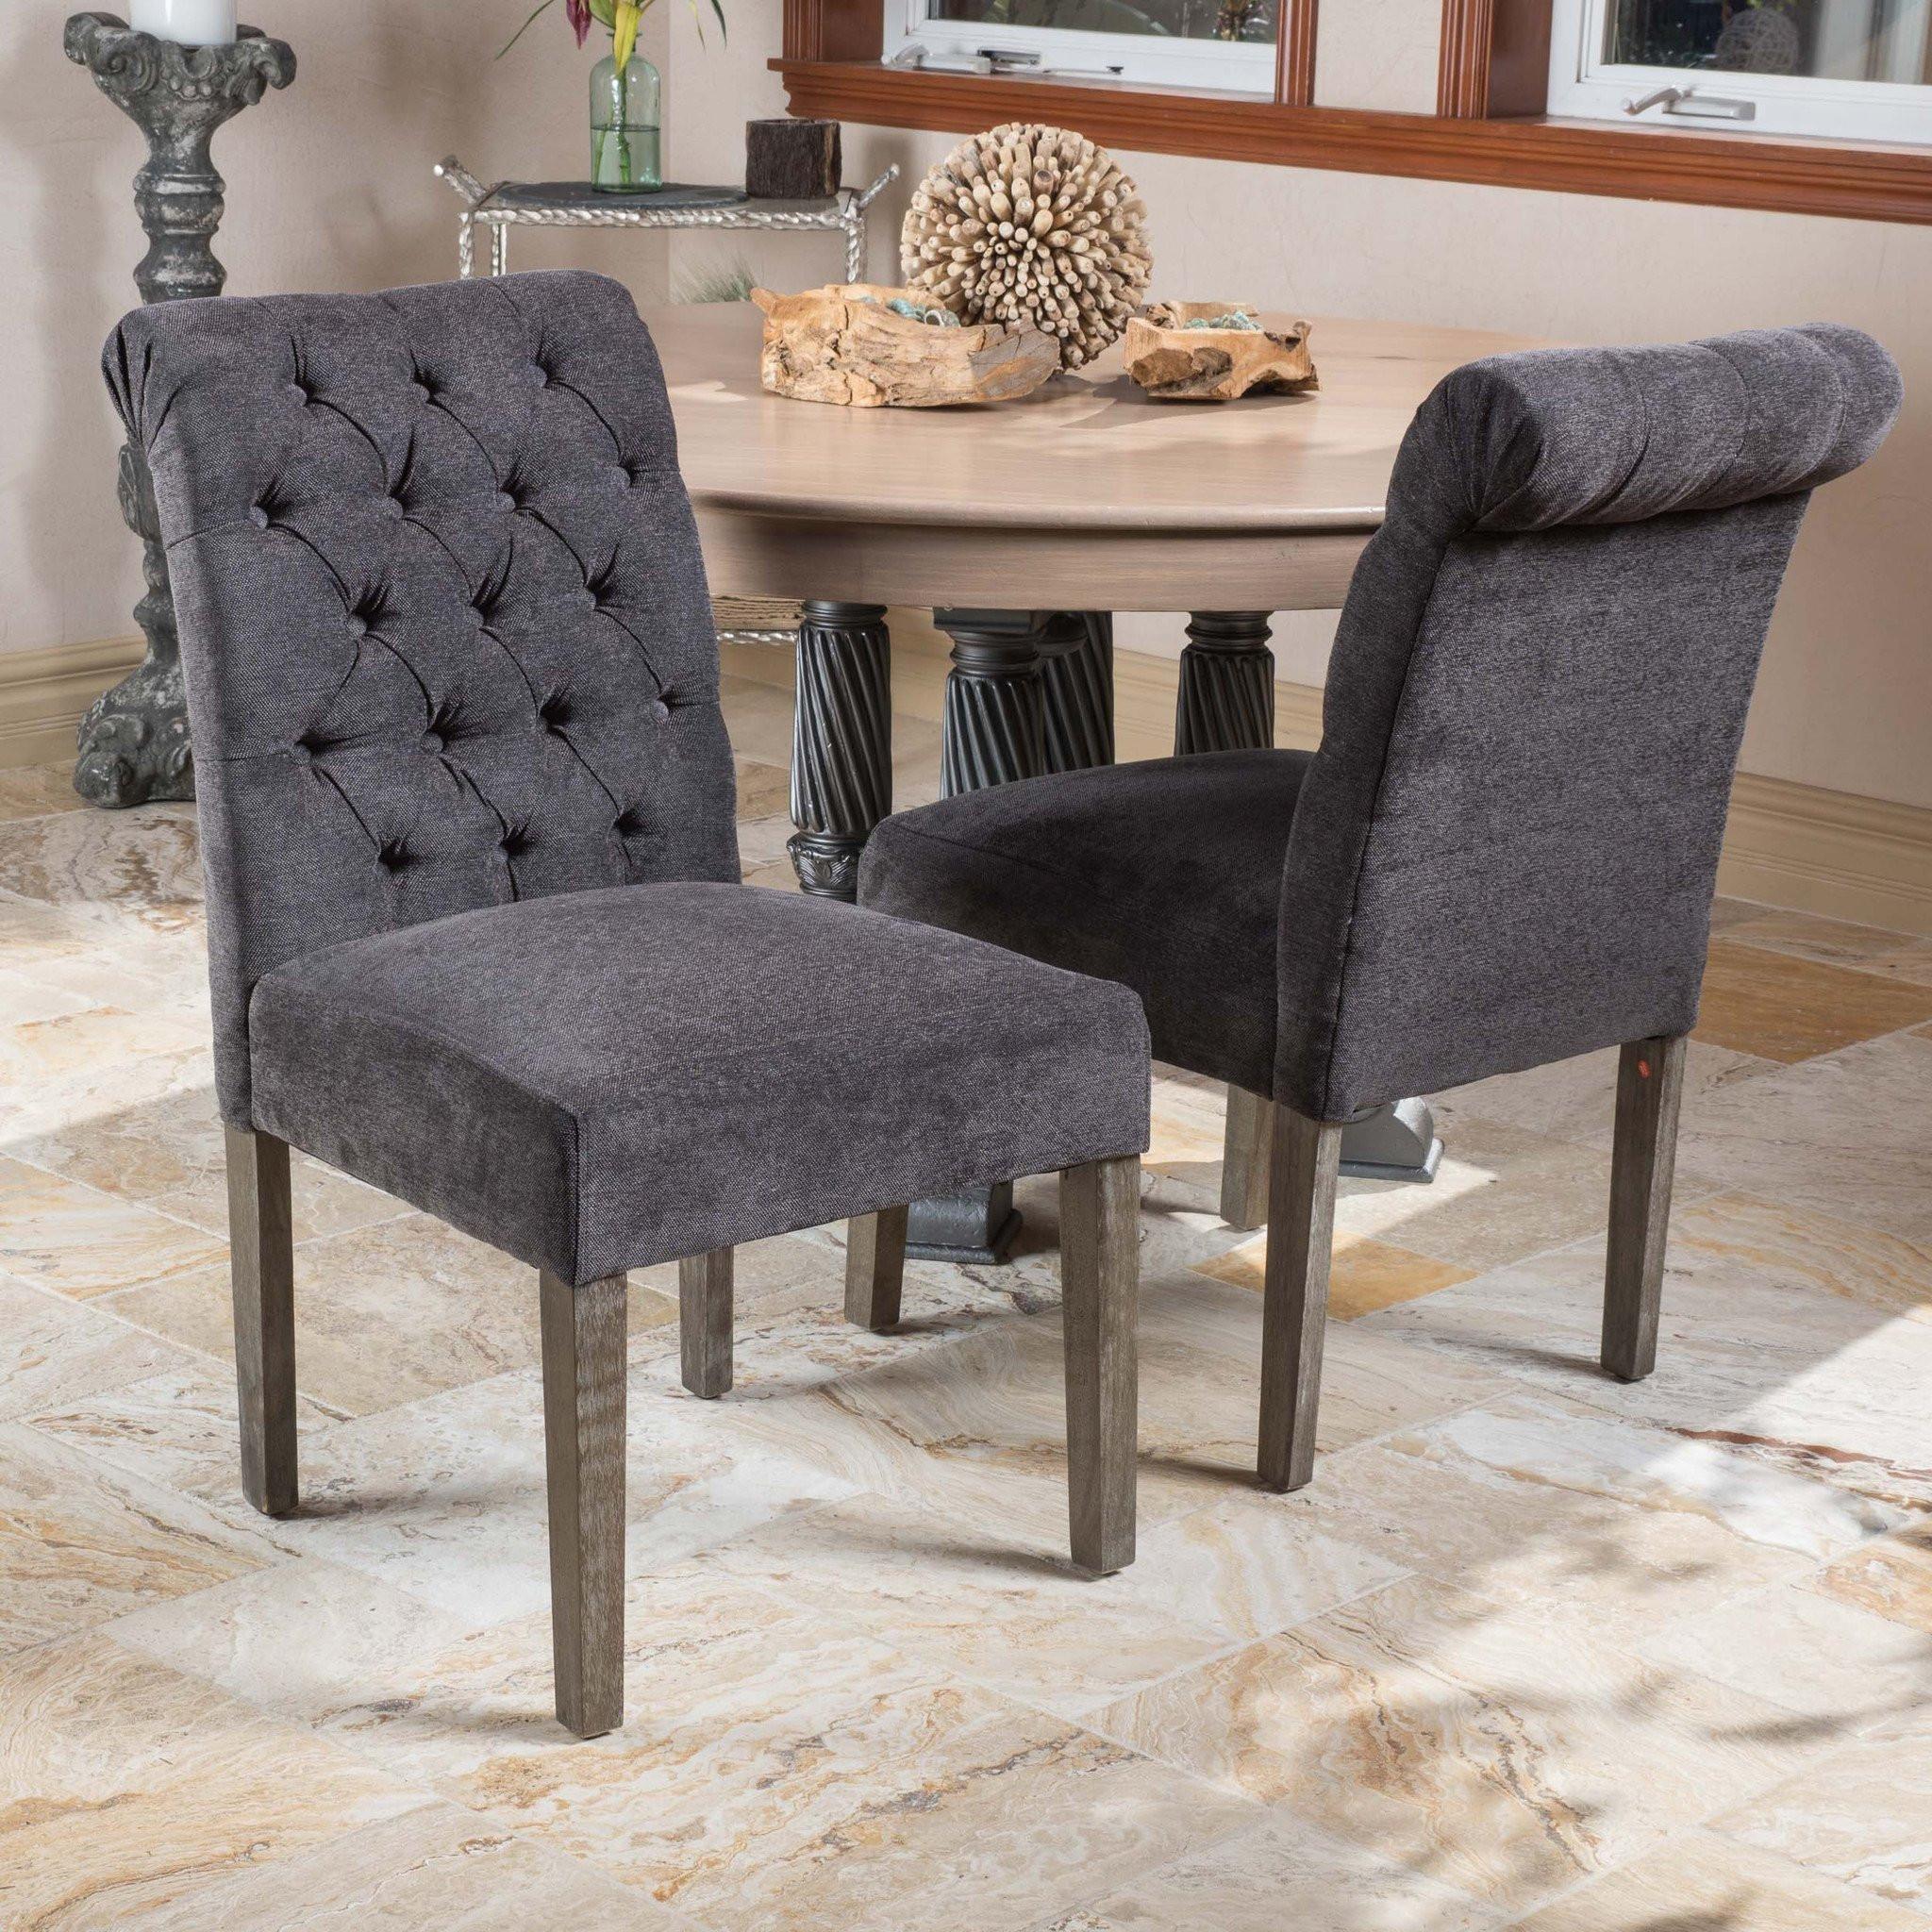 Elmerson Dark Grey Linen Dining Chair (Set of 2)